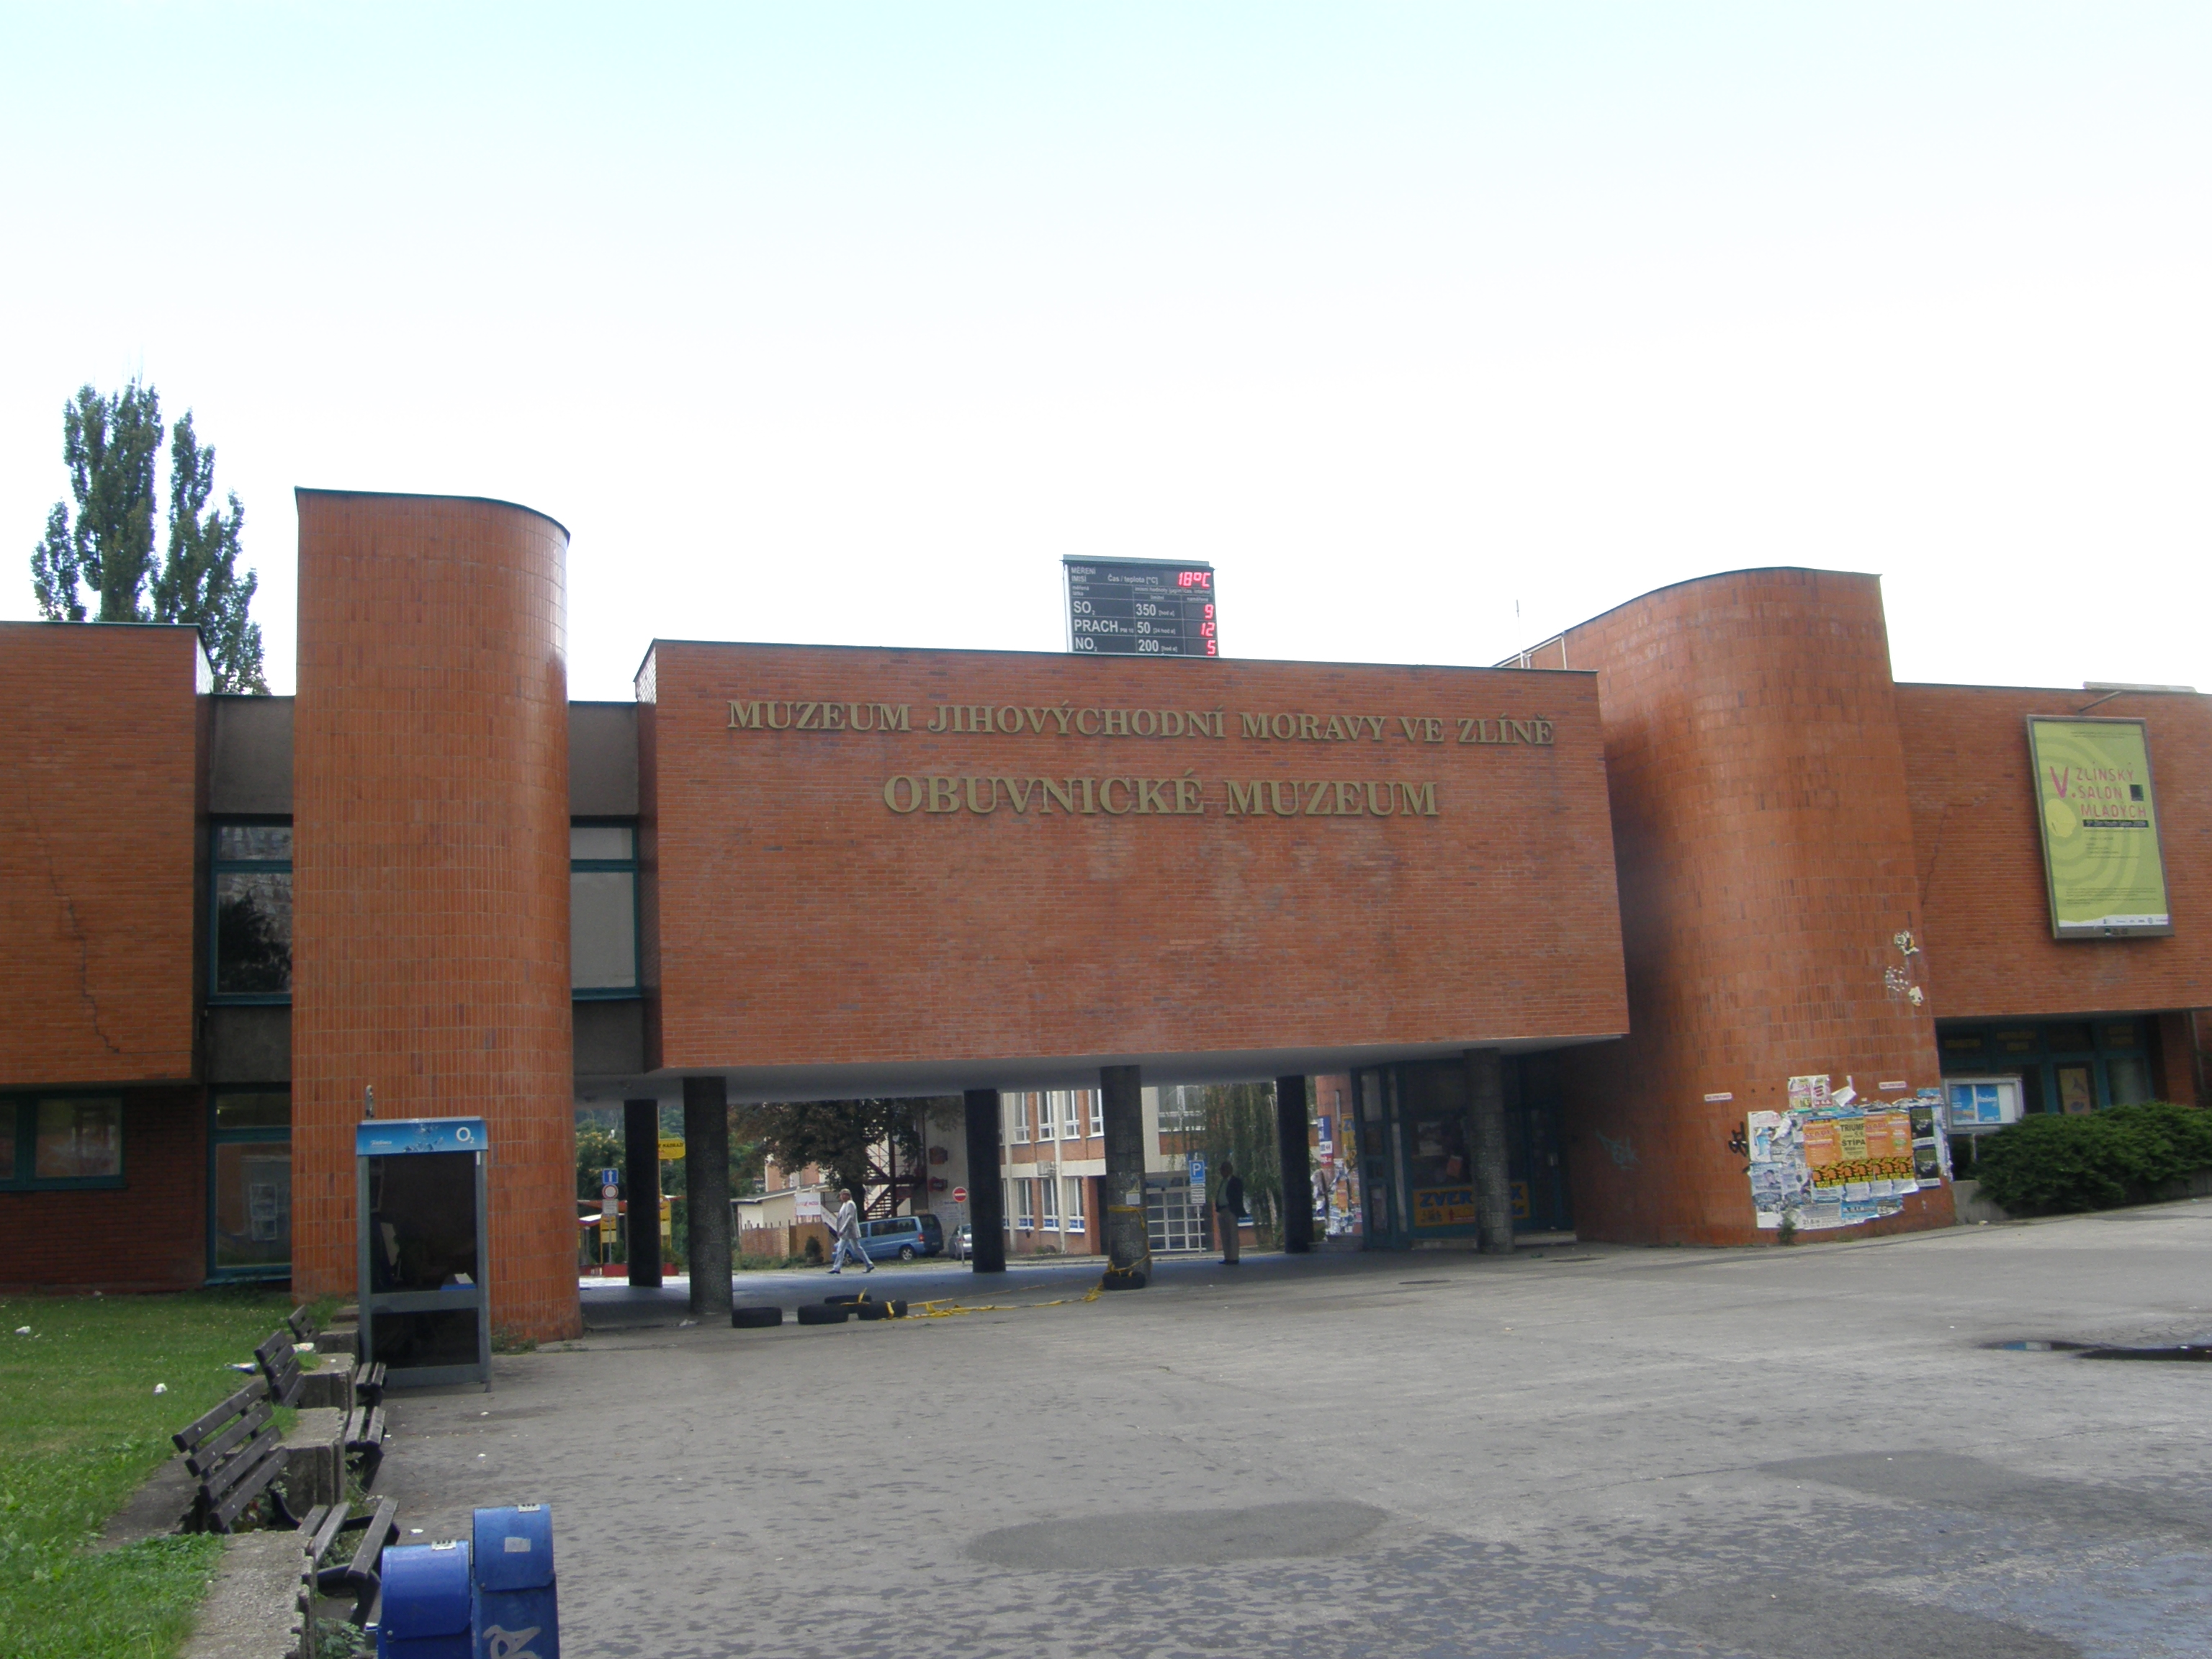 File Obuvnicke muzeum ve Zline.JPG - Wikimedia Commons a3193d44b5